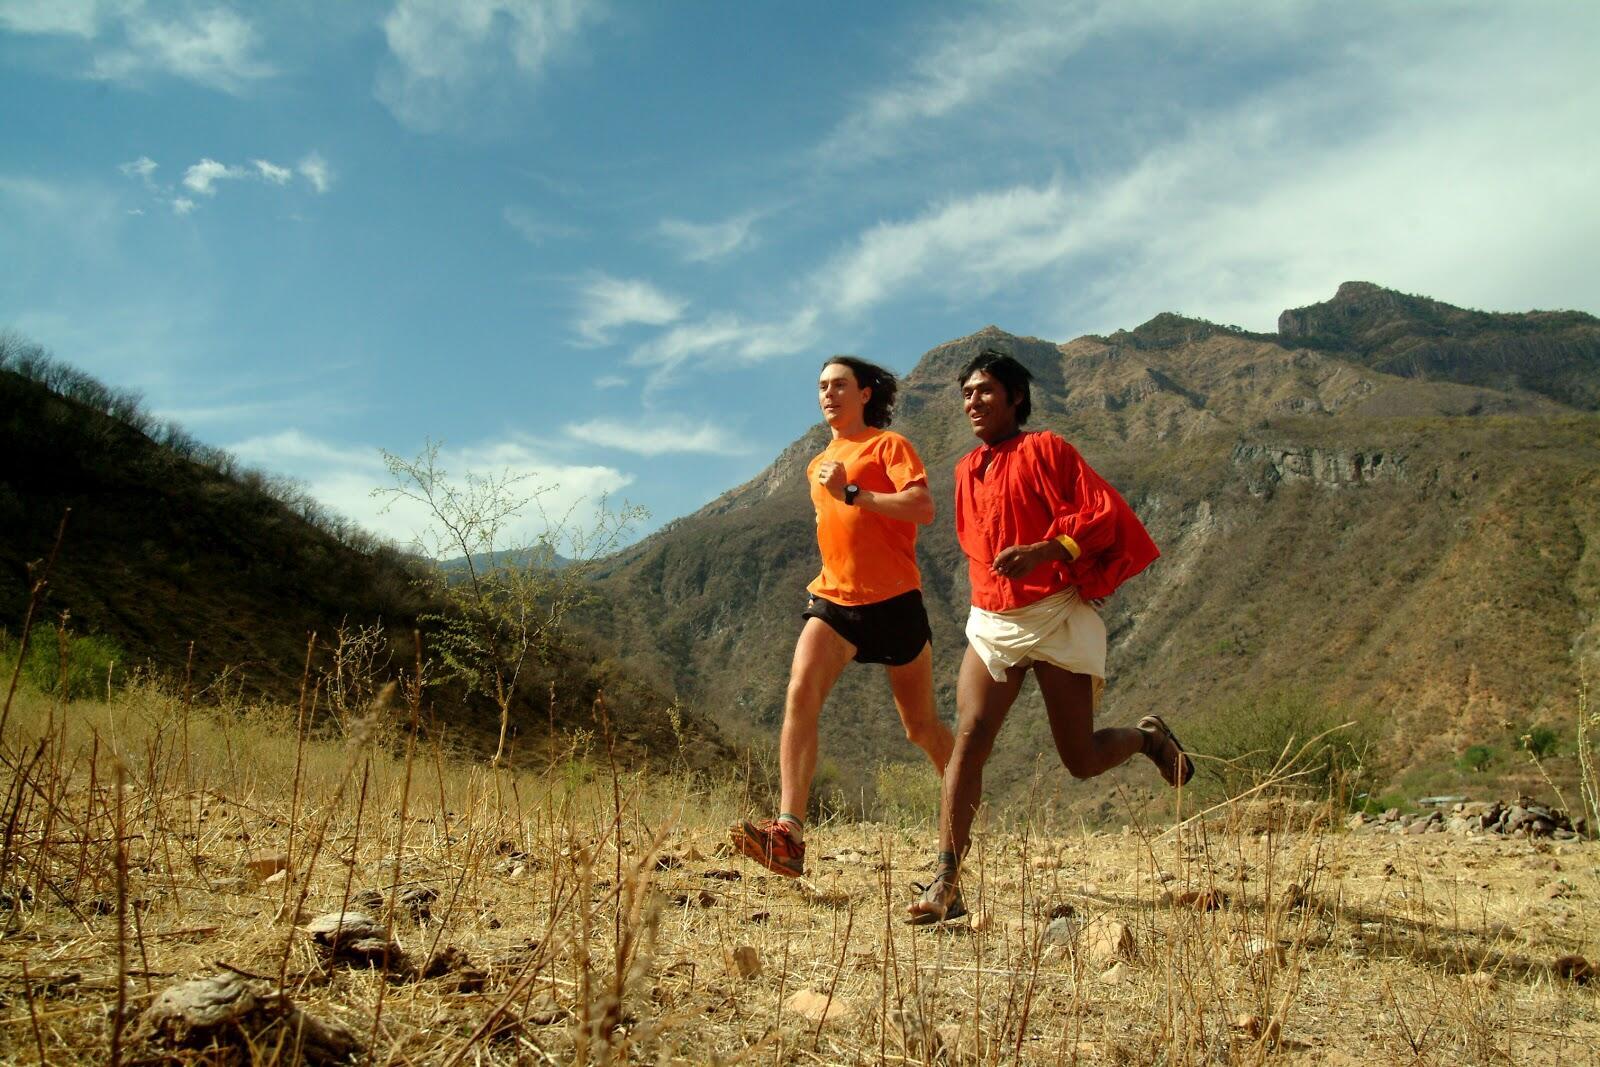 Tarahumara vs Runner